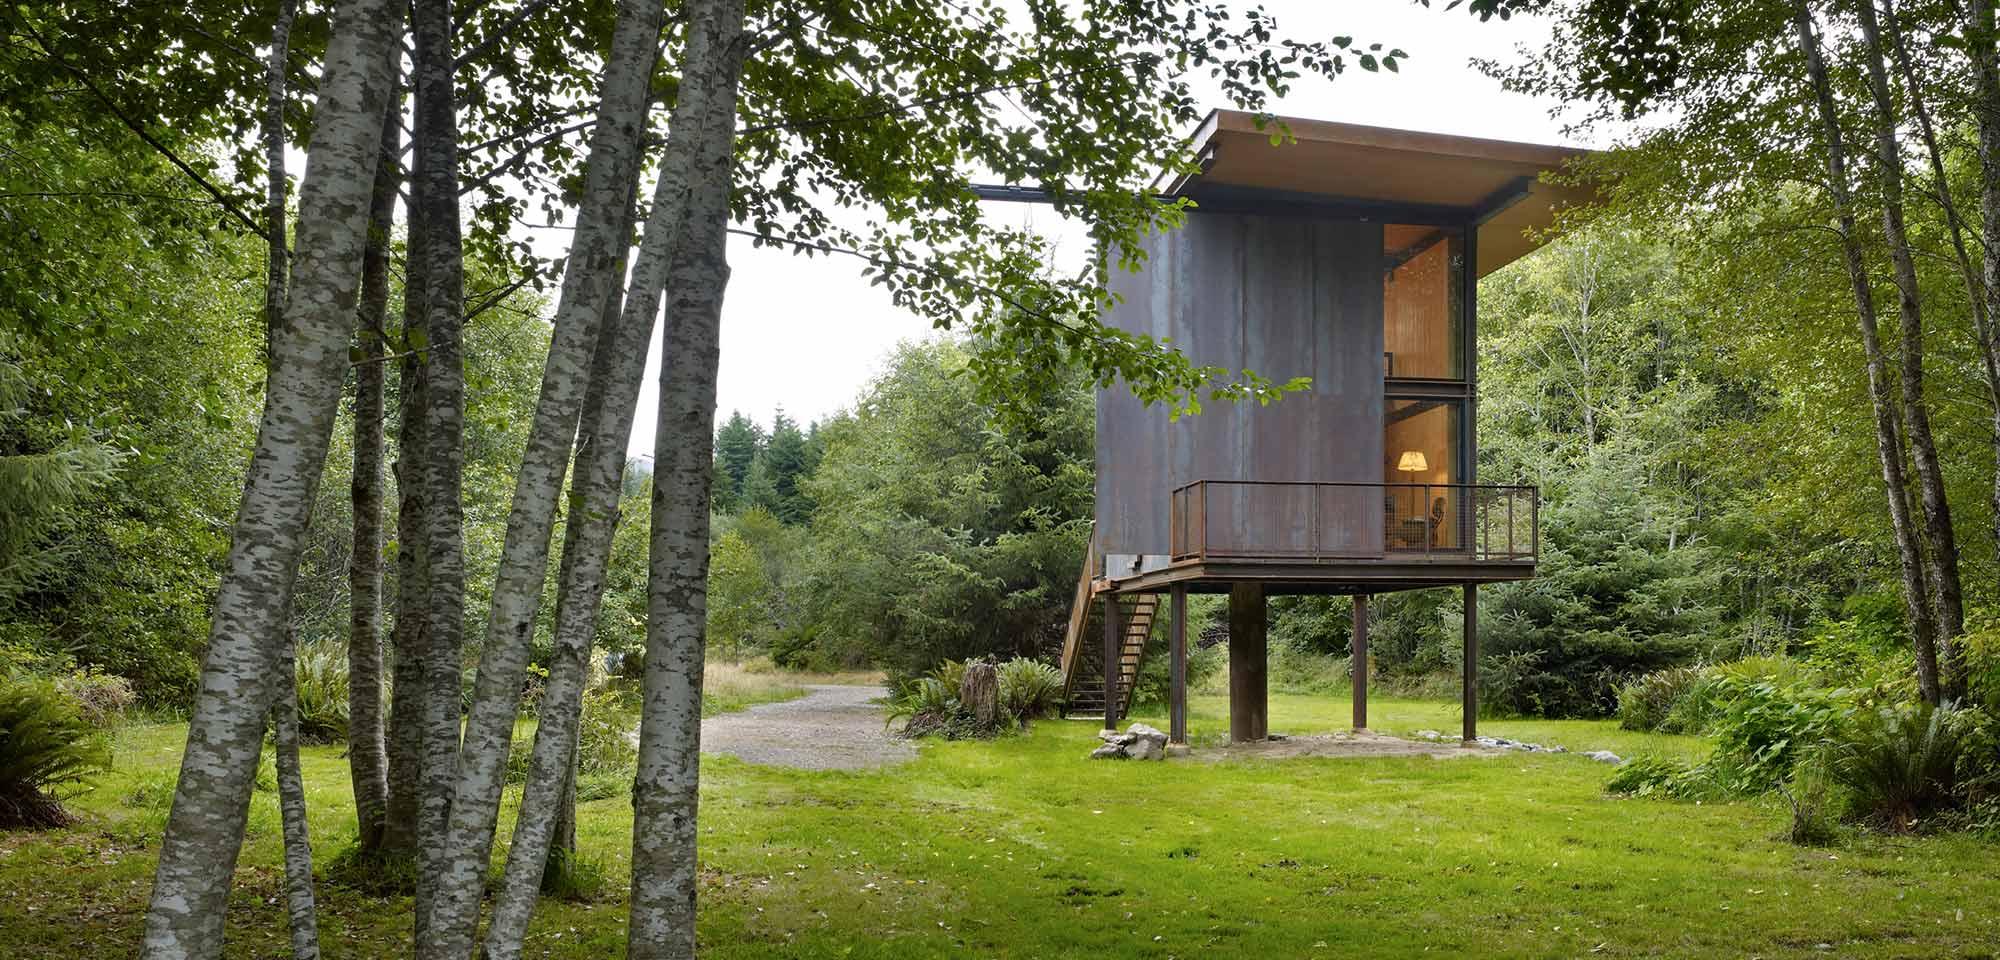 Sol Duc Cabin designed by Tom Kundig